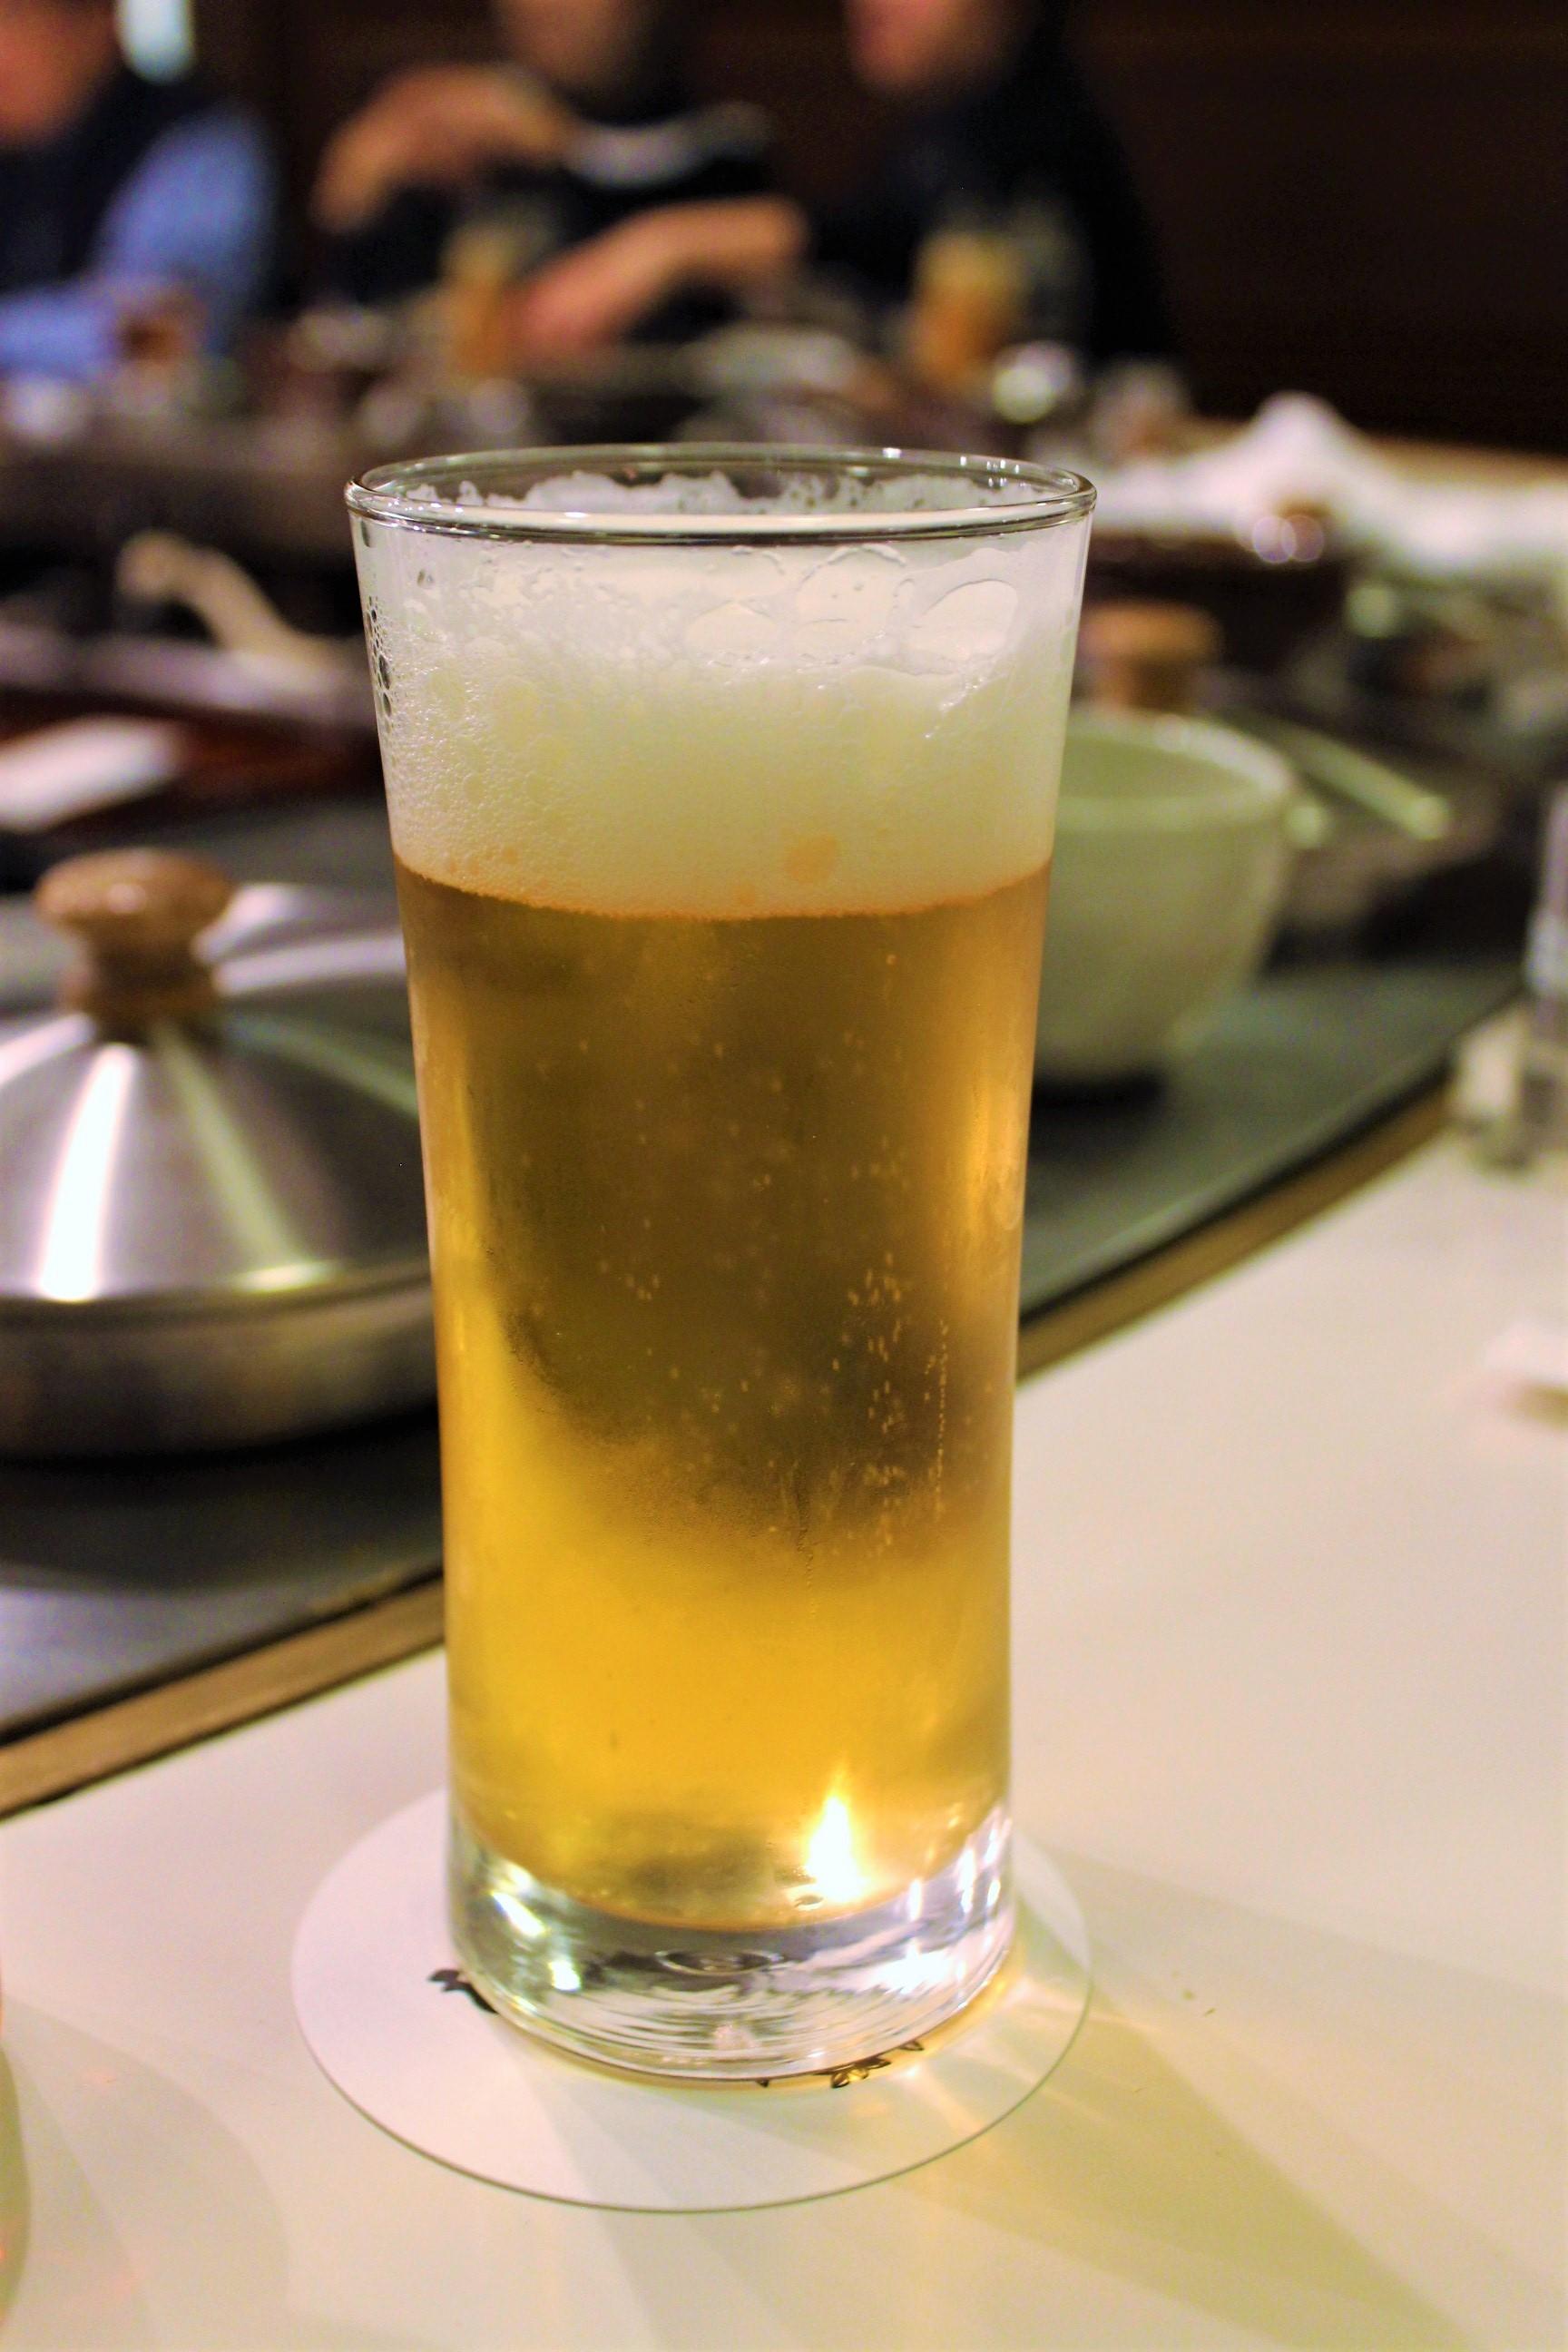 Draft Beer at Shabusen in Tokyo, Japan